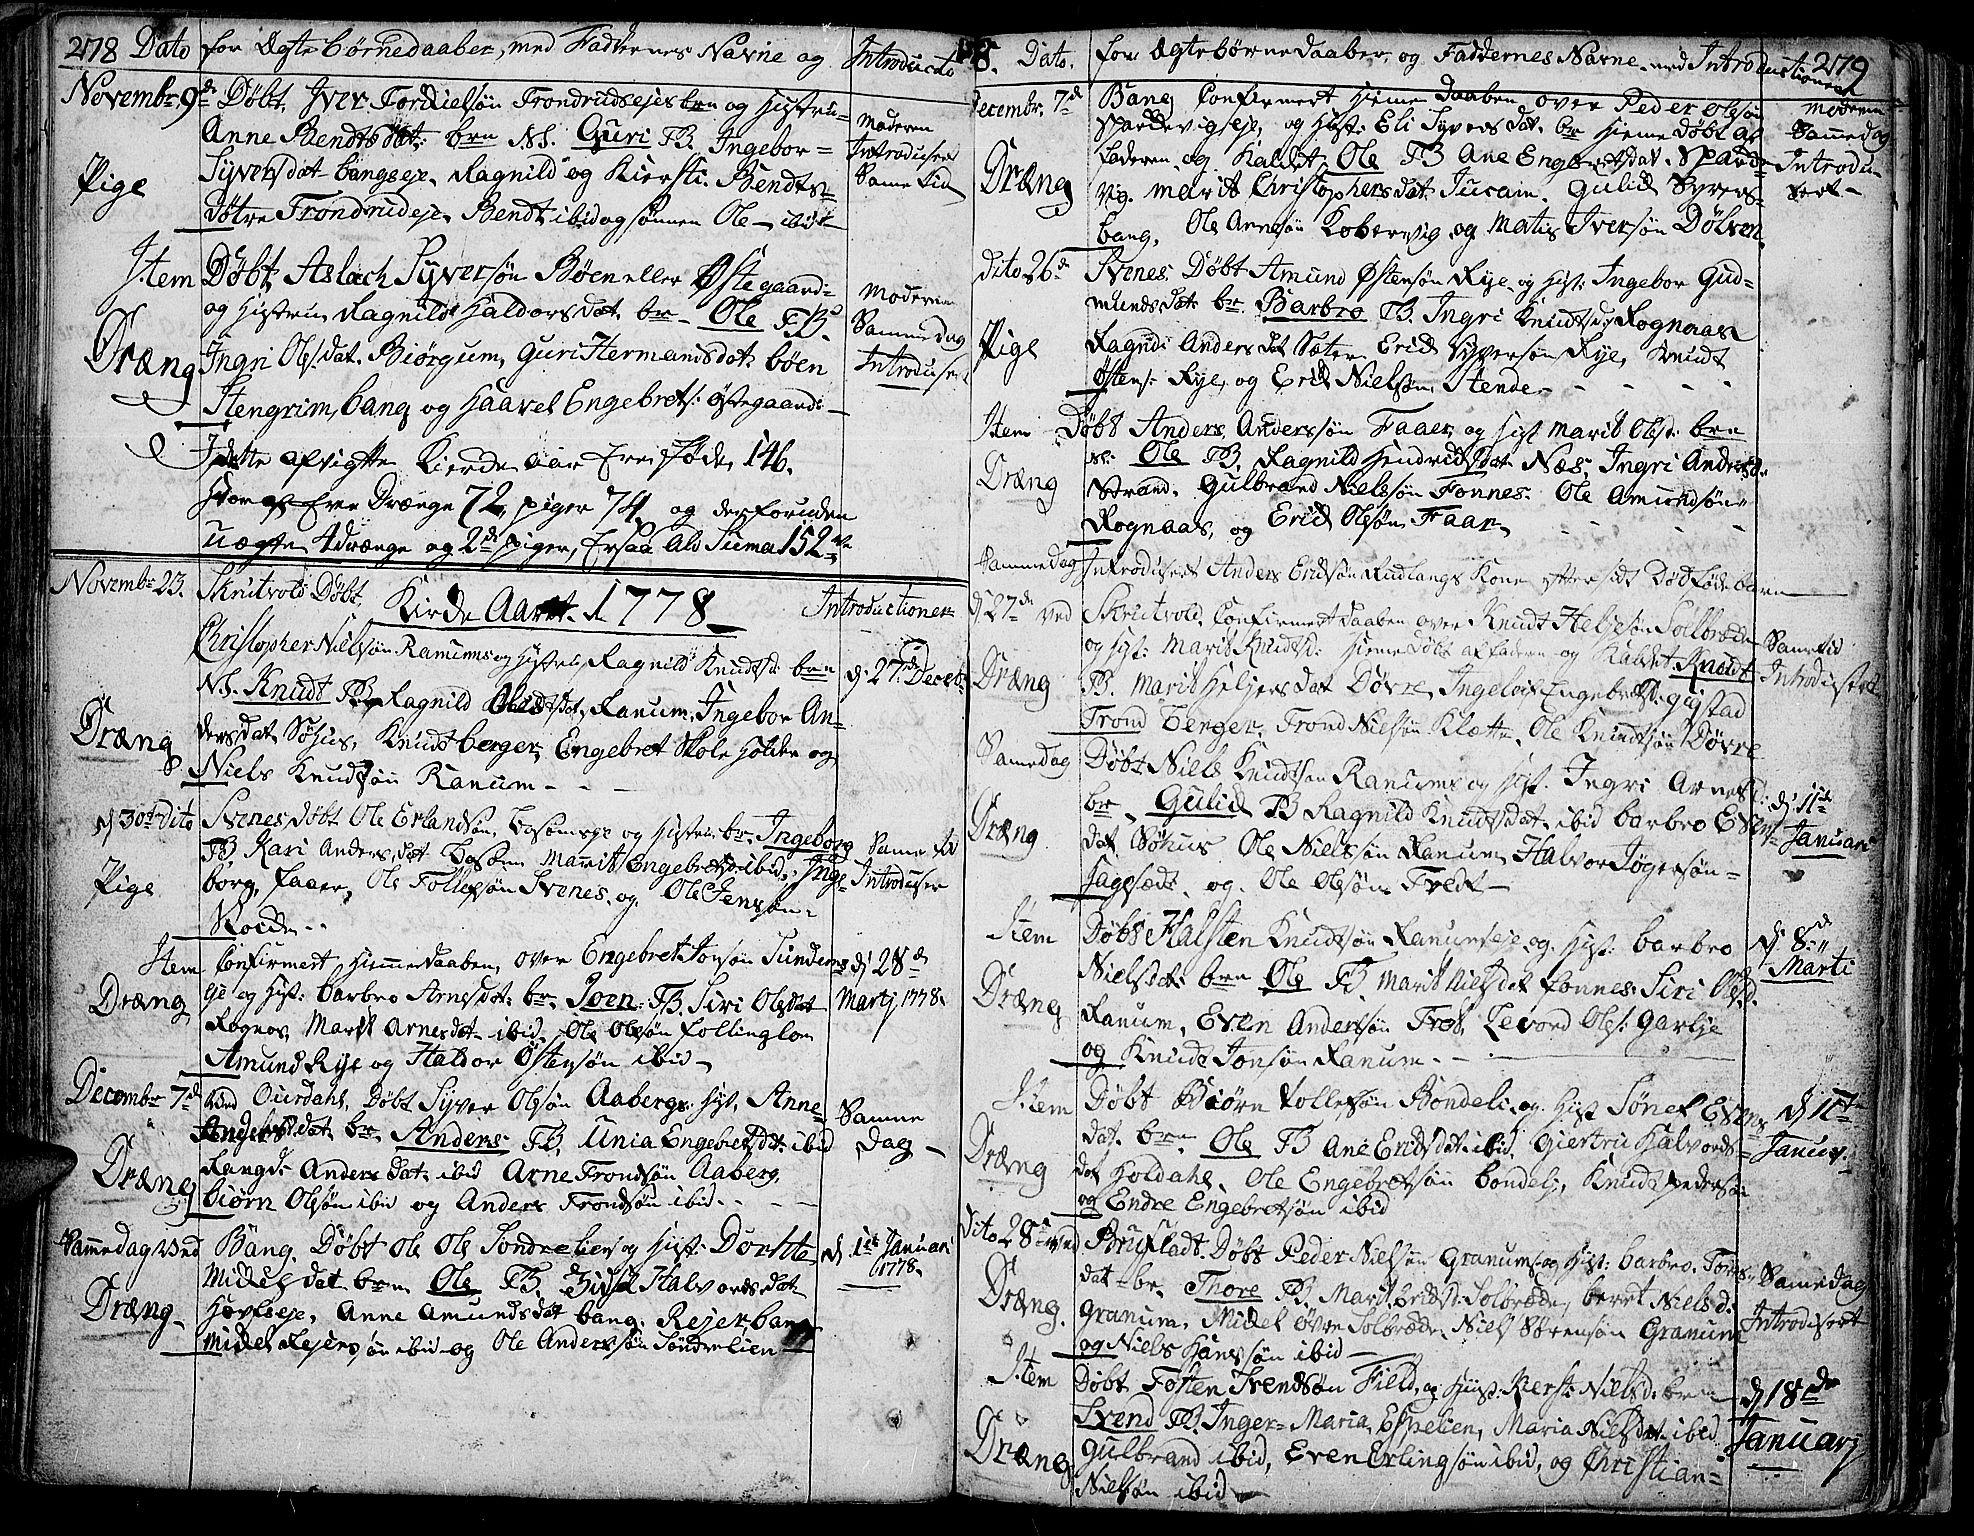 SAH, Aurdal prestekontor, Ministerialbok nr. 5, 1763-1781, s. 278-279